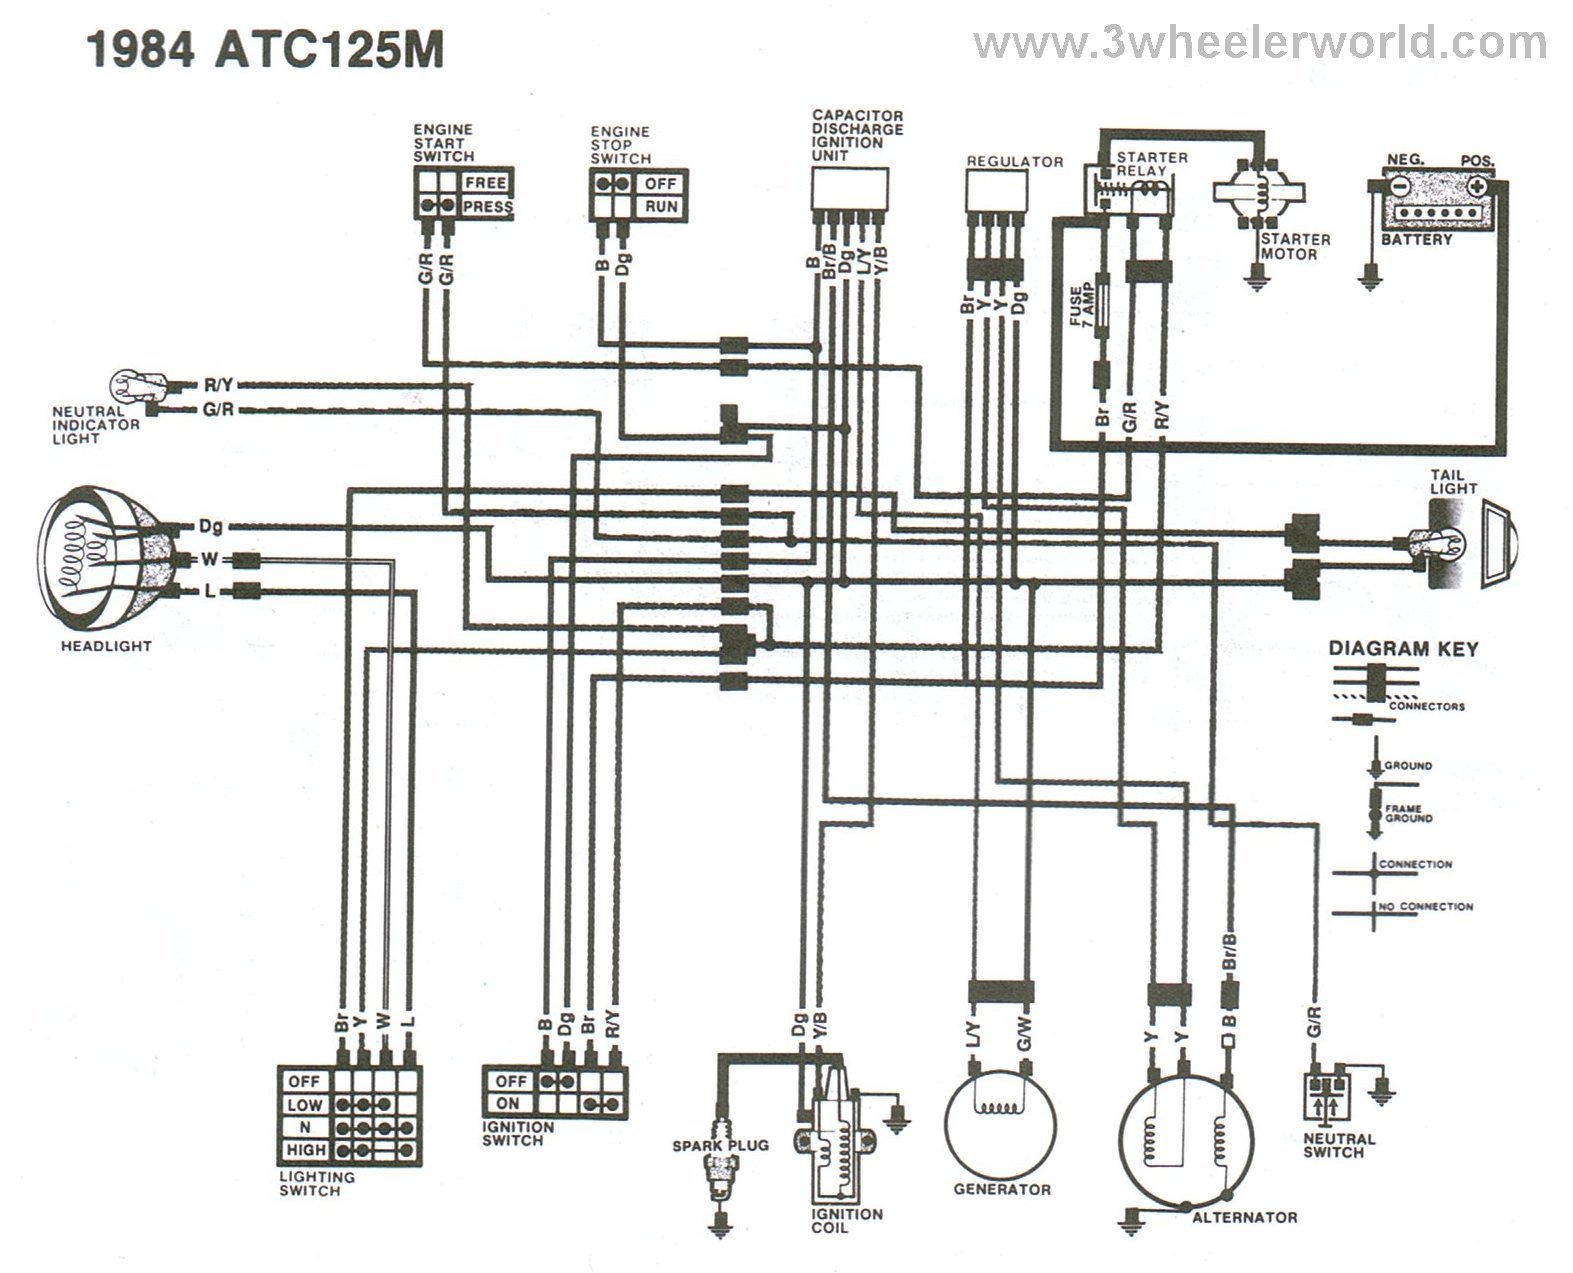 Gy6 5 Wire Rectifier Wiring Diagram on 50cc Atv Wiring Diagram